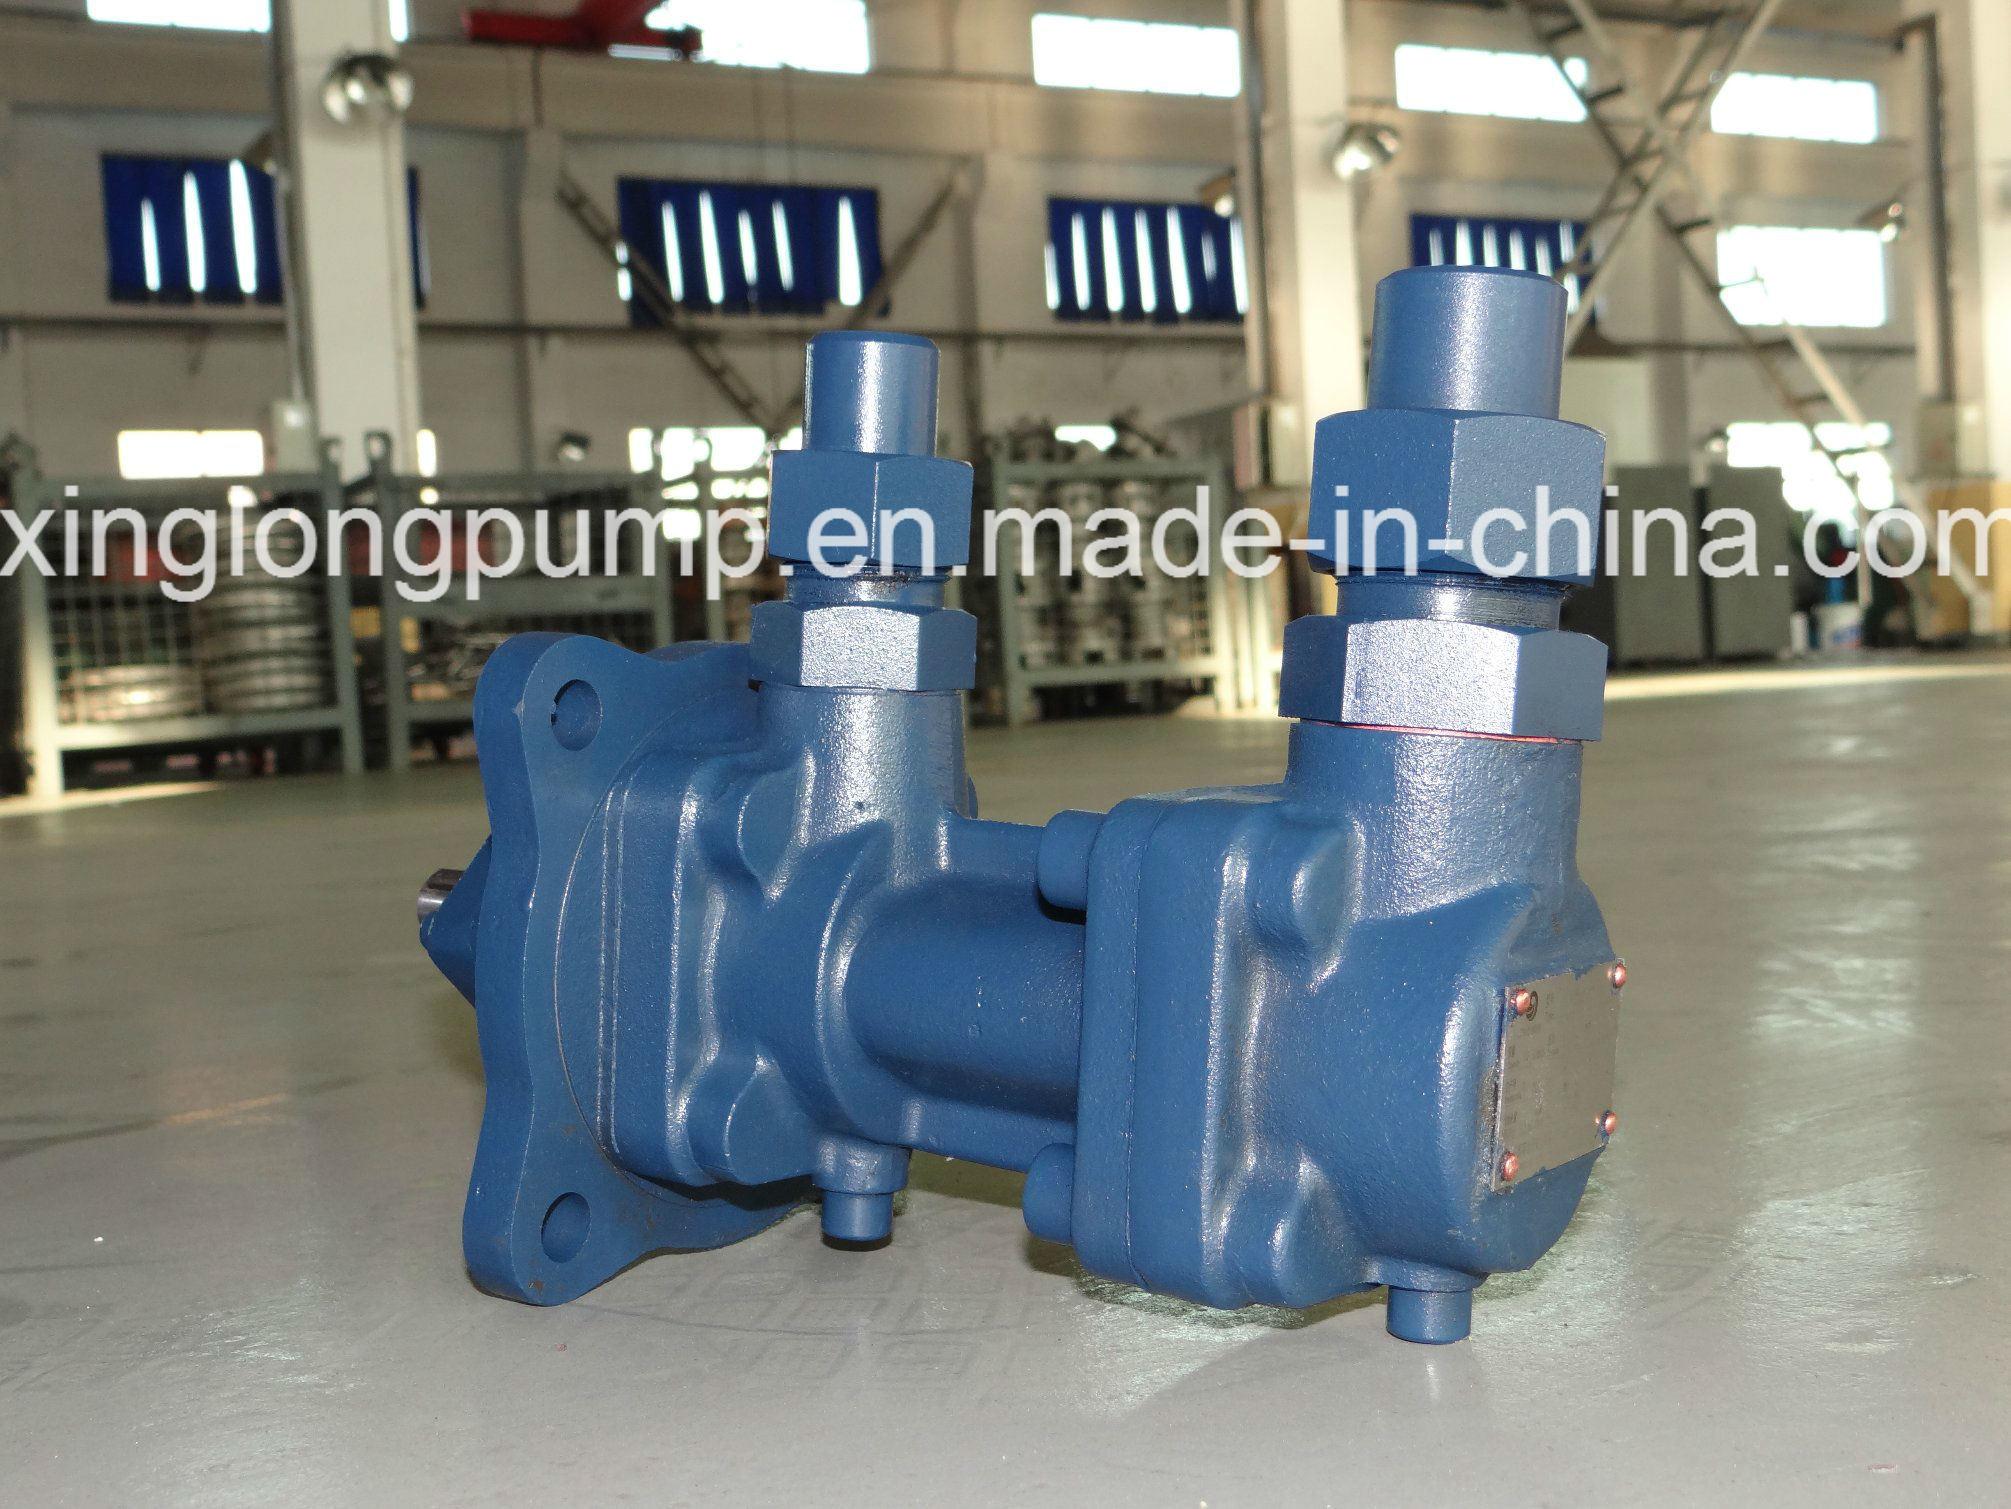 China High Pressure Steam Boiler Feed Water Pump/ Furnace Oil Pump ...